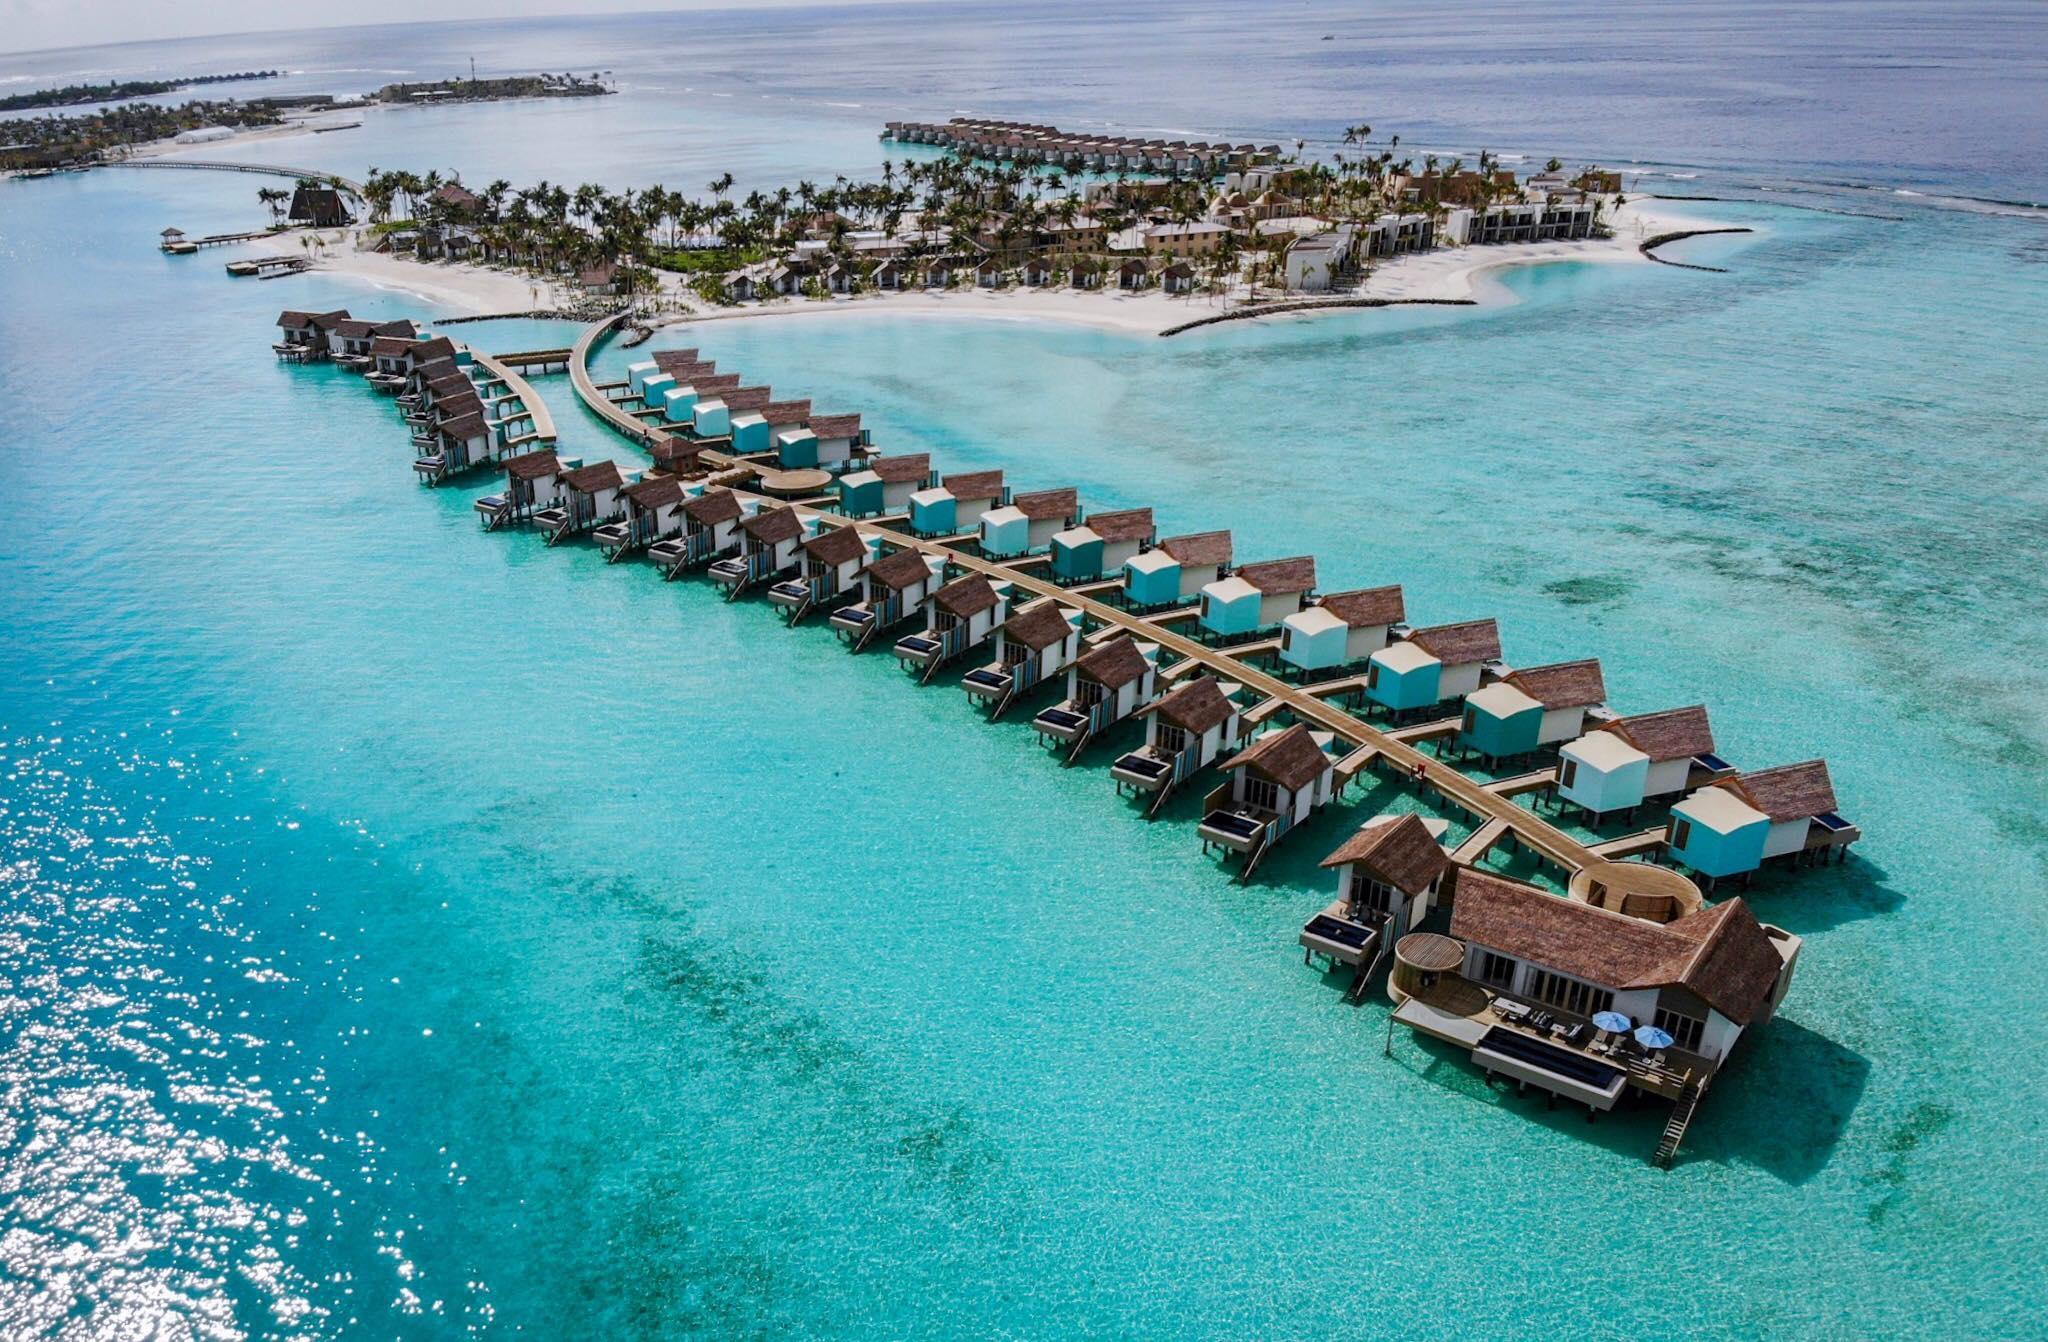 Hard Rock Hotel Maldives (ฮาร์ดร็อค โฮเทล มัลดีฟส์) ไม่รวมตั๋วเครื่องบิน ราคาเริ่มต้นเพียง 17,700 บาท เหมาะสำหรับครอบครัว